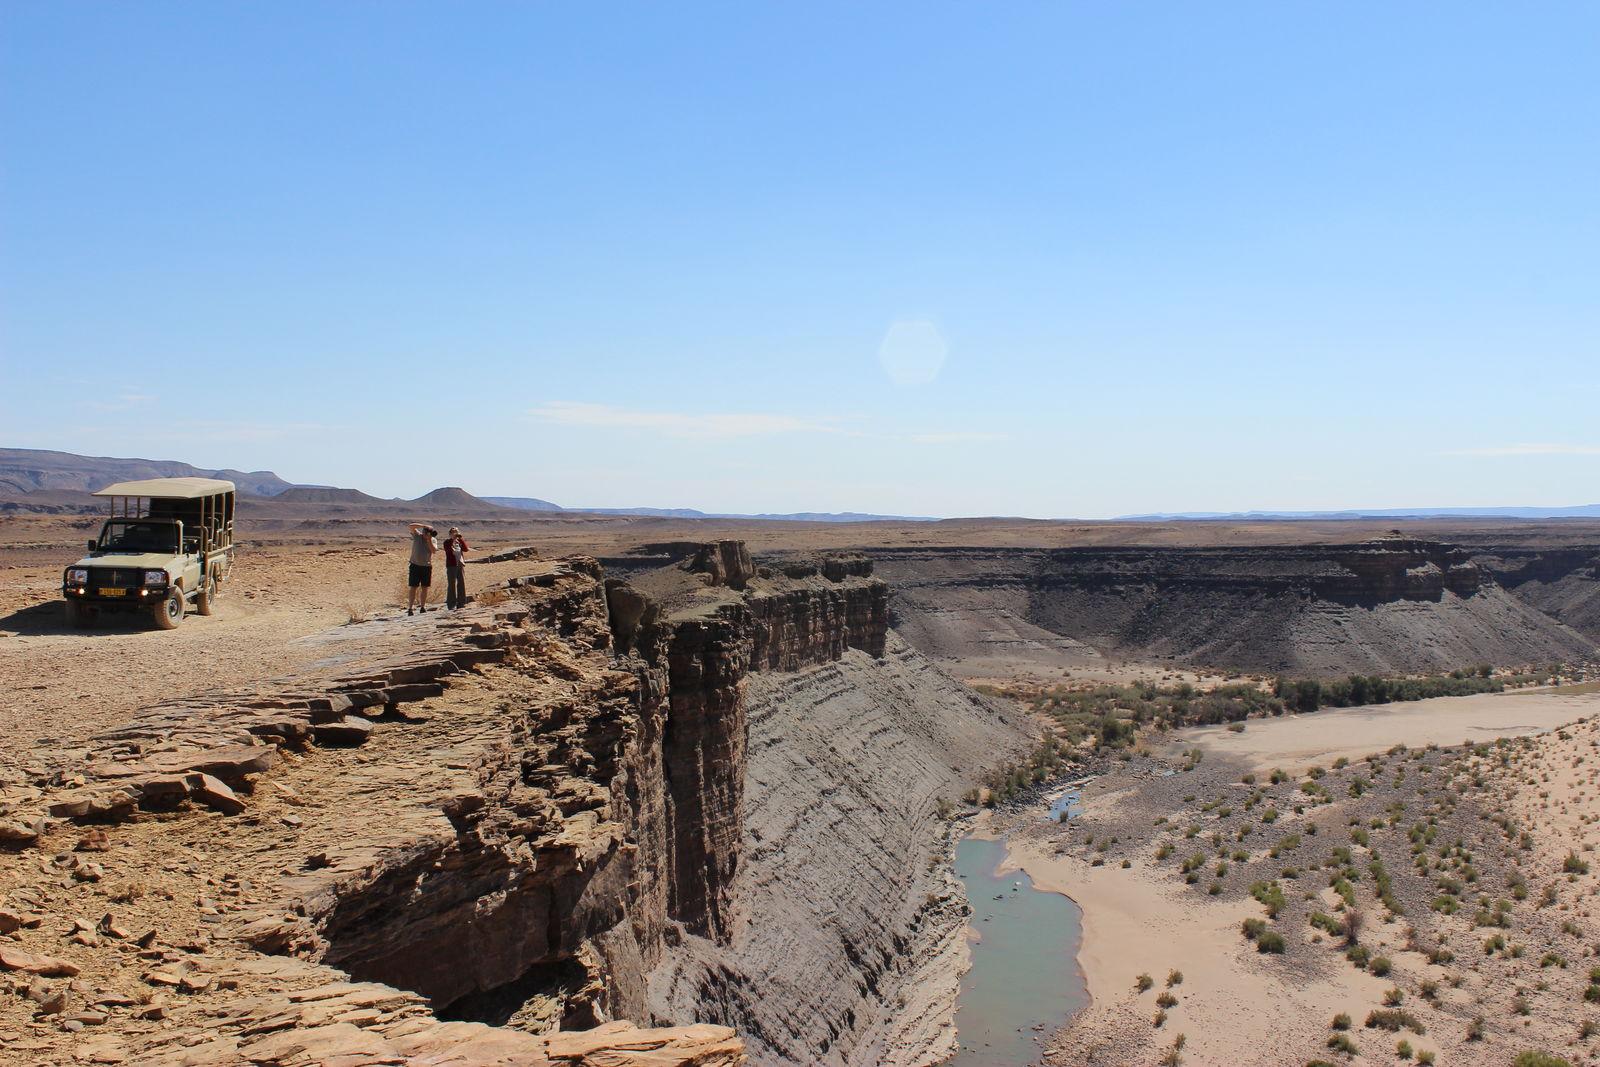 Rondreis kleurrijk NamibIe, fotogeniek | AmbianceTravel